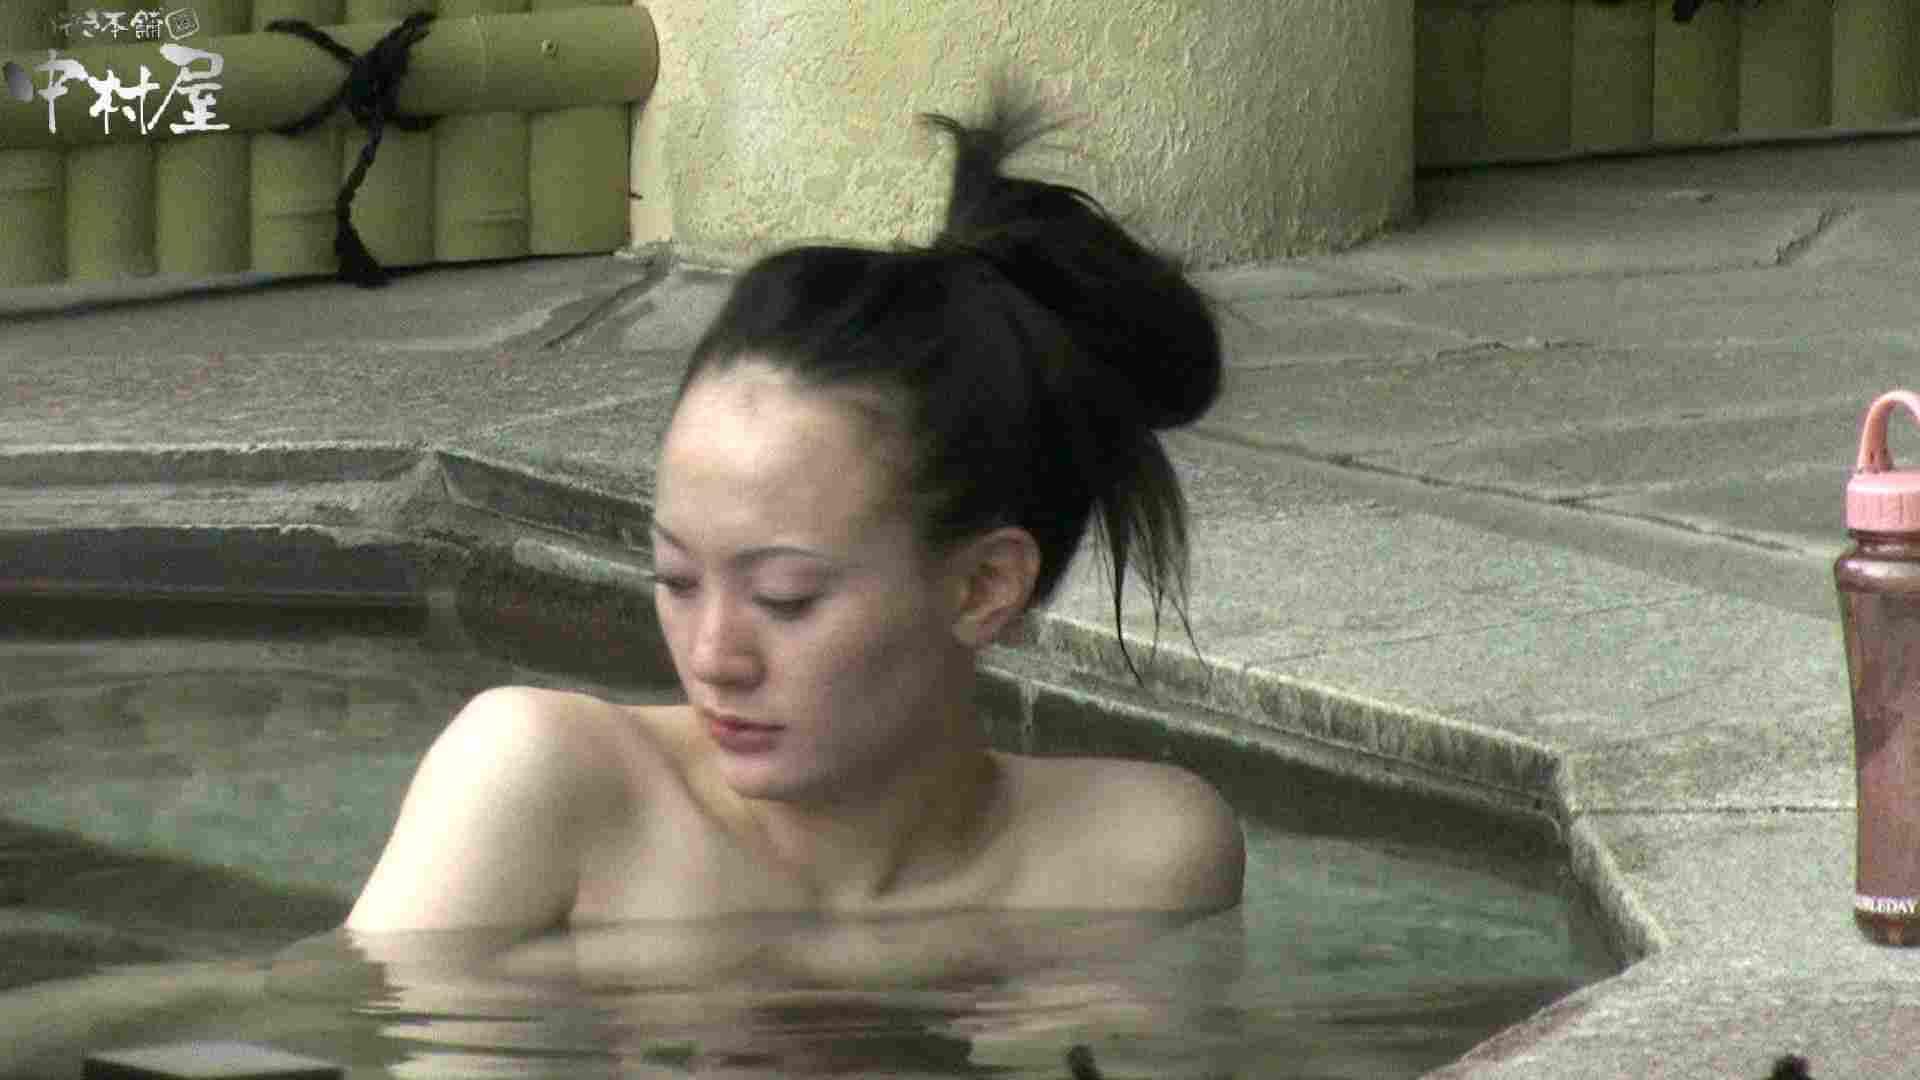 Aquaな露天風呂Vol.900 盗撮シリーズ | 露天風呂編  110PIX 55